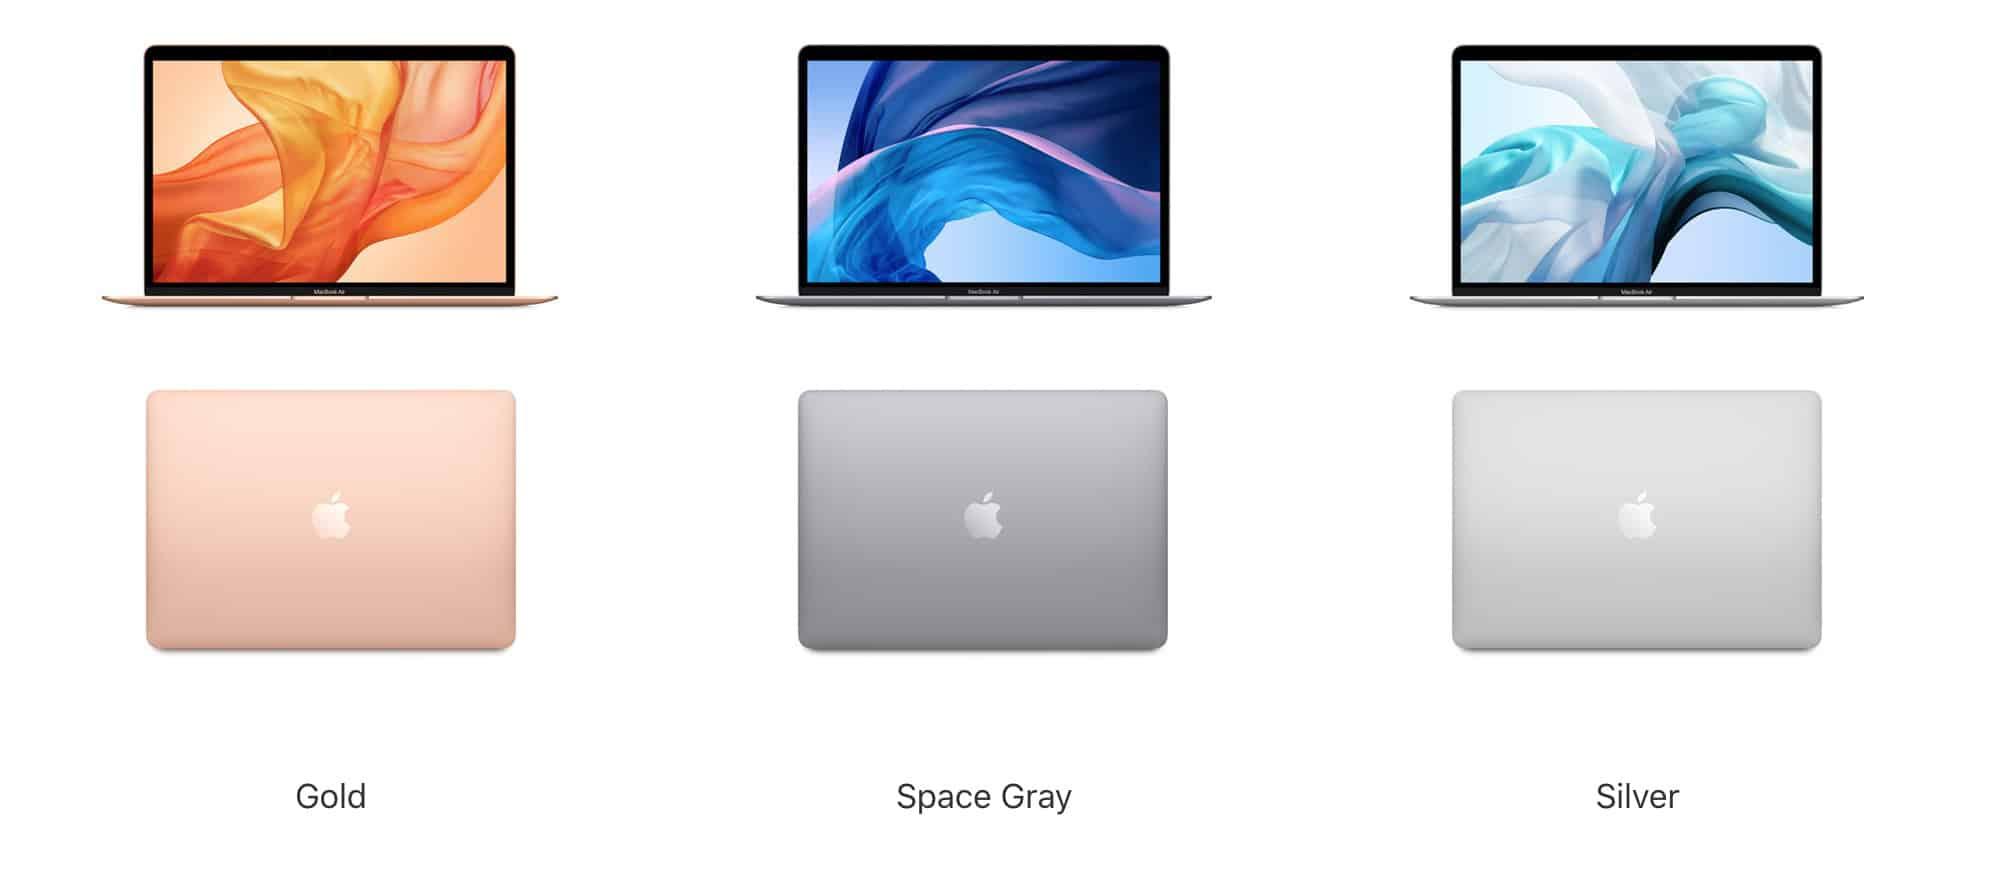 color-macbook-air-2020-laptopvang.com